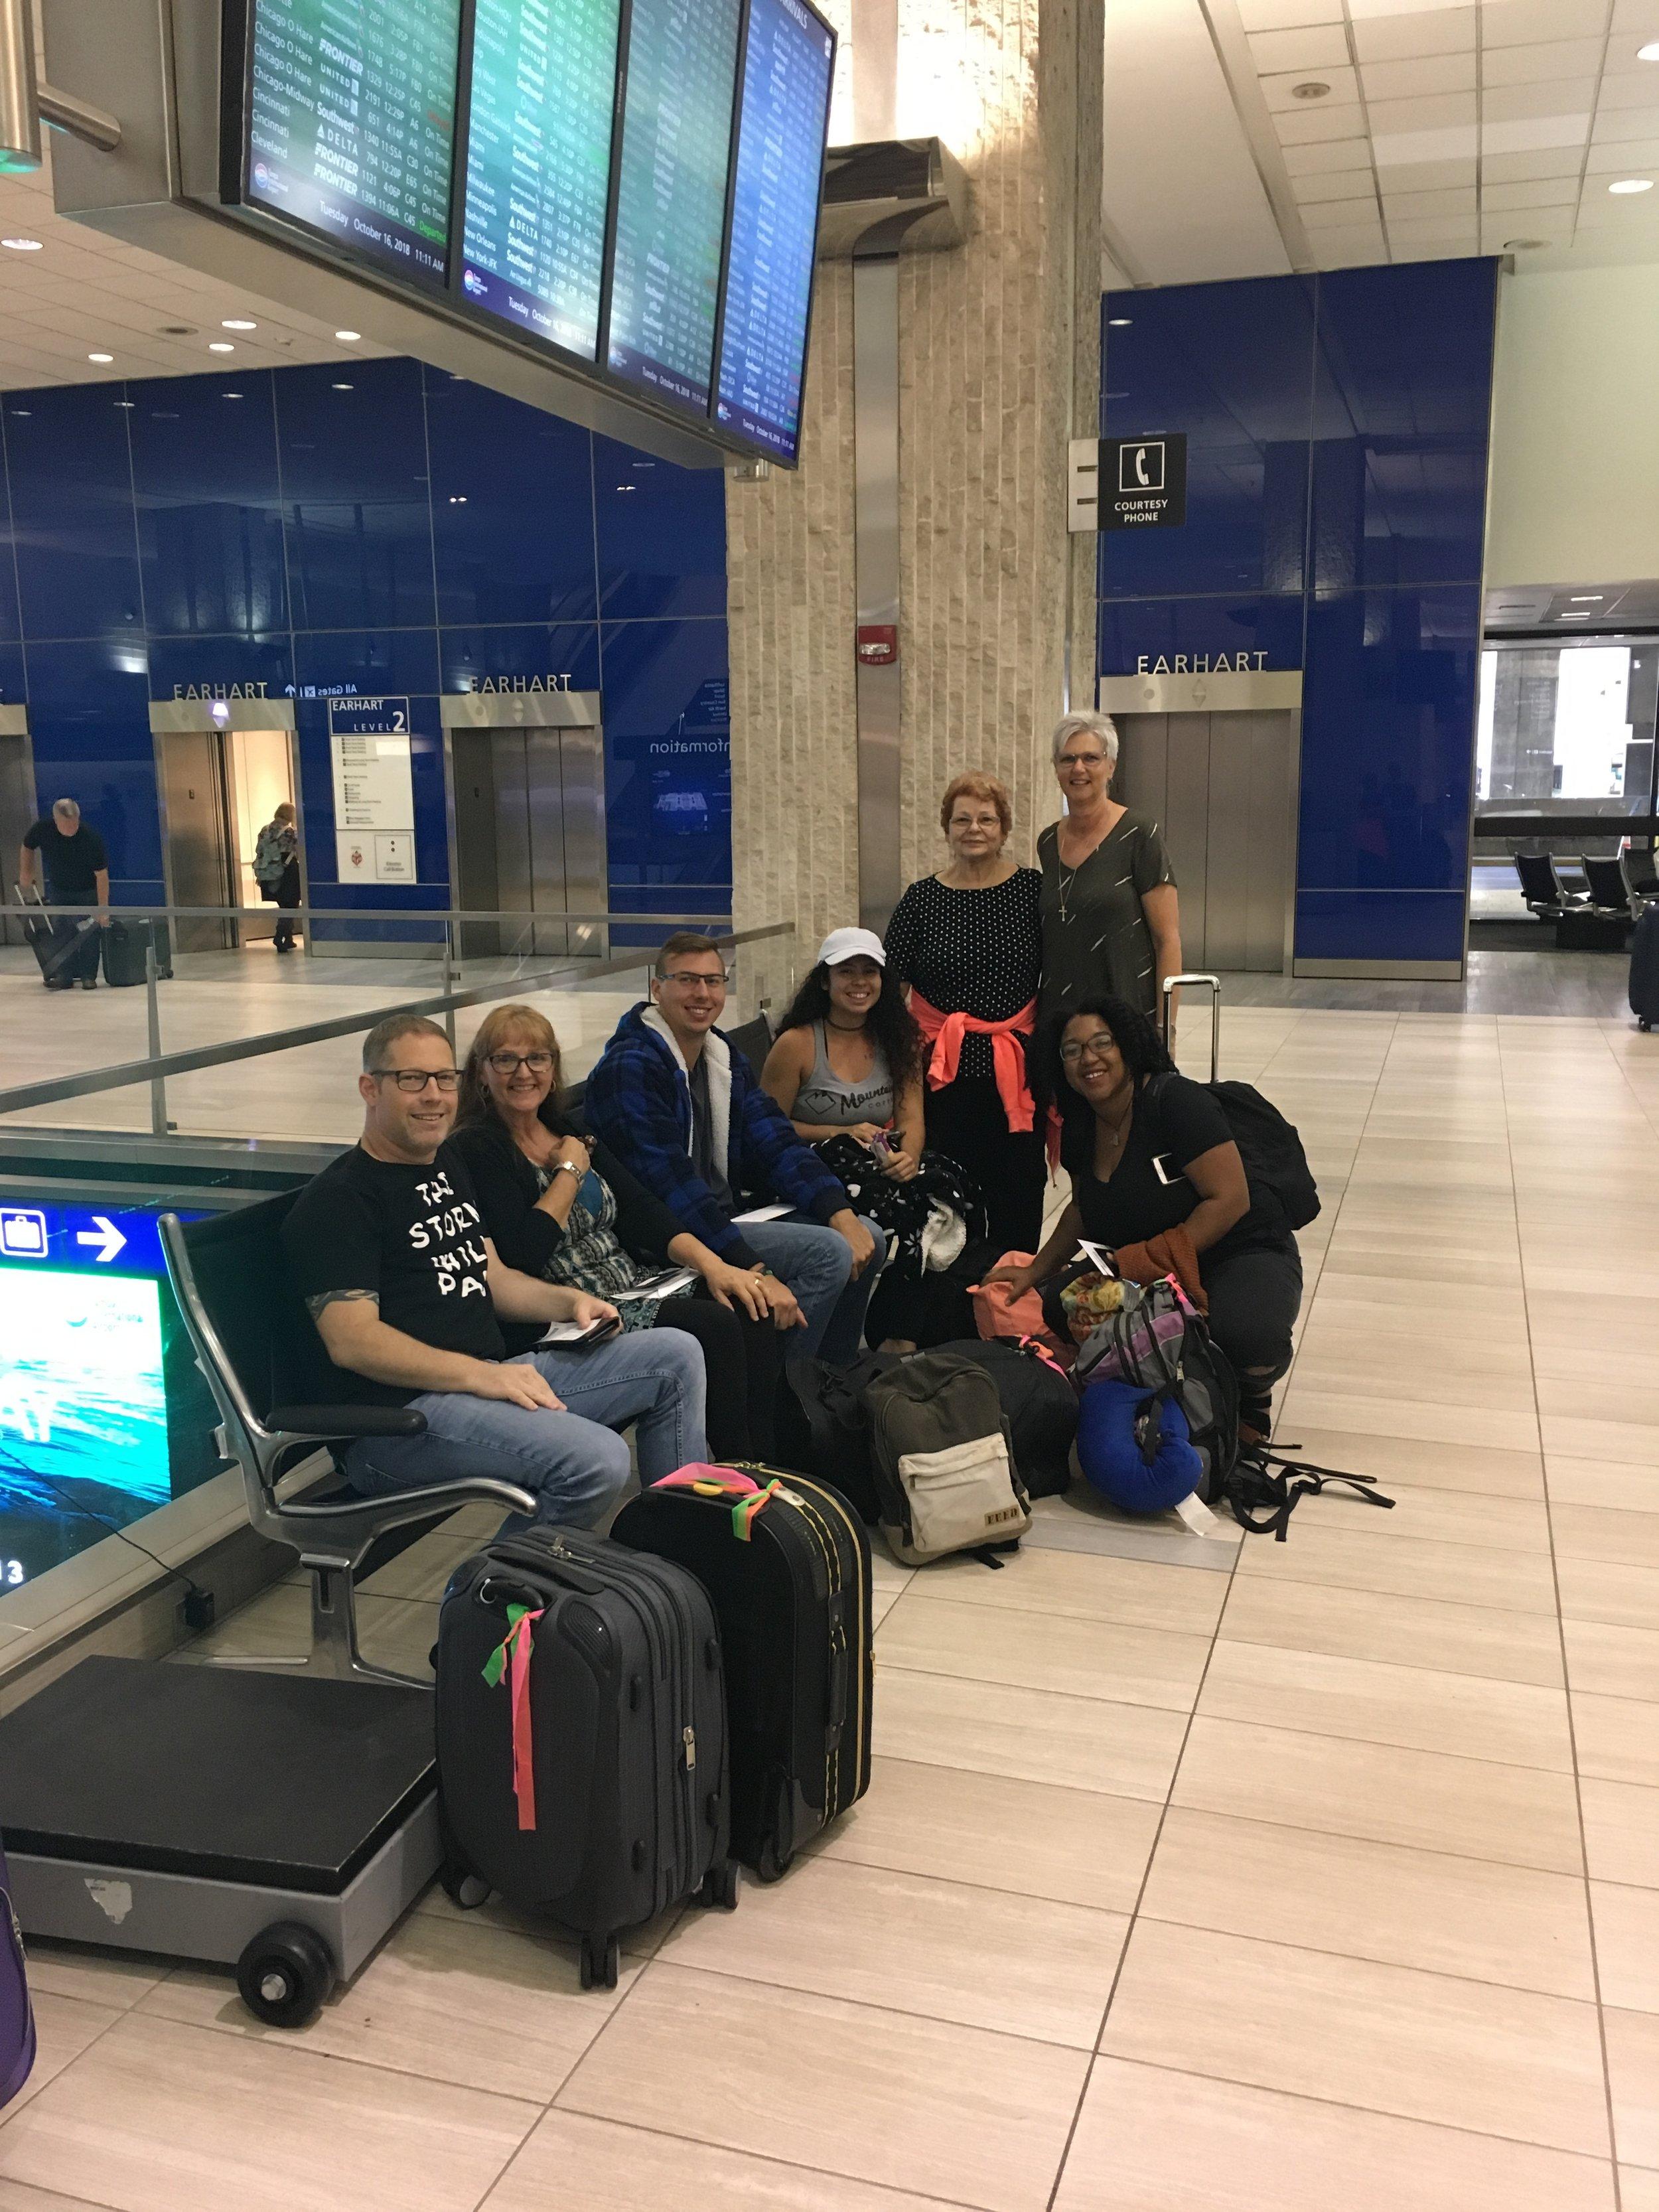 The Kenya Team at Tampa International Airport